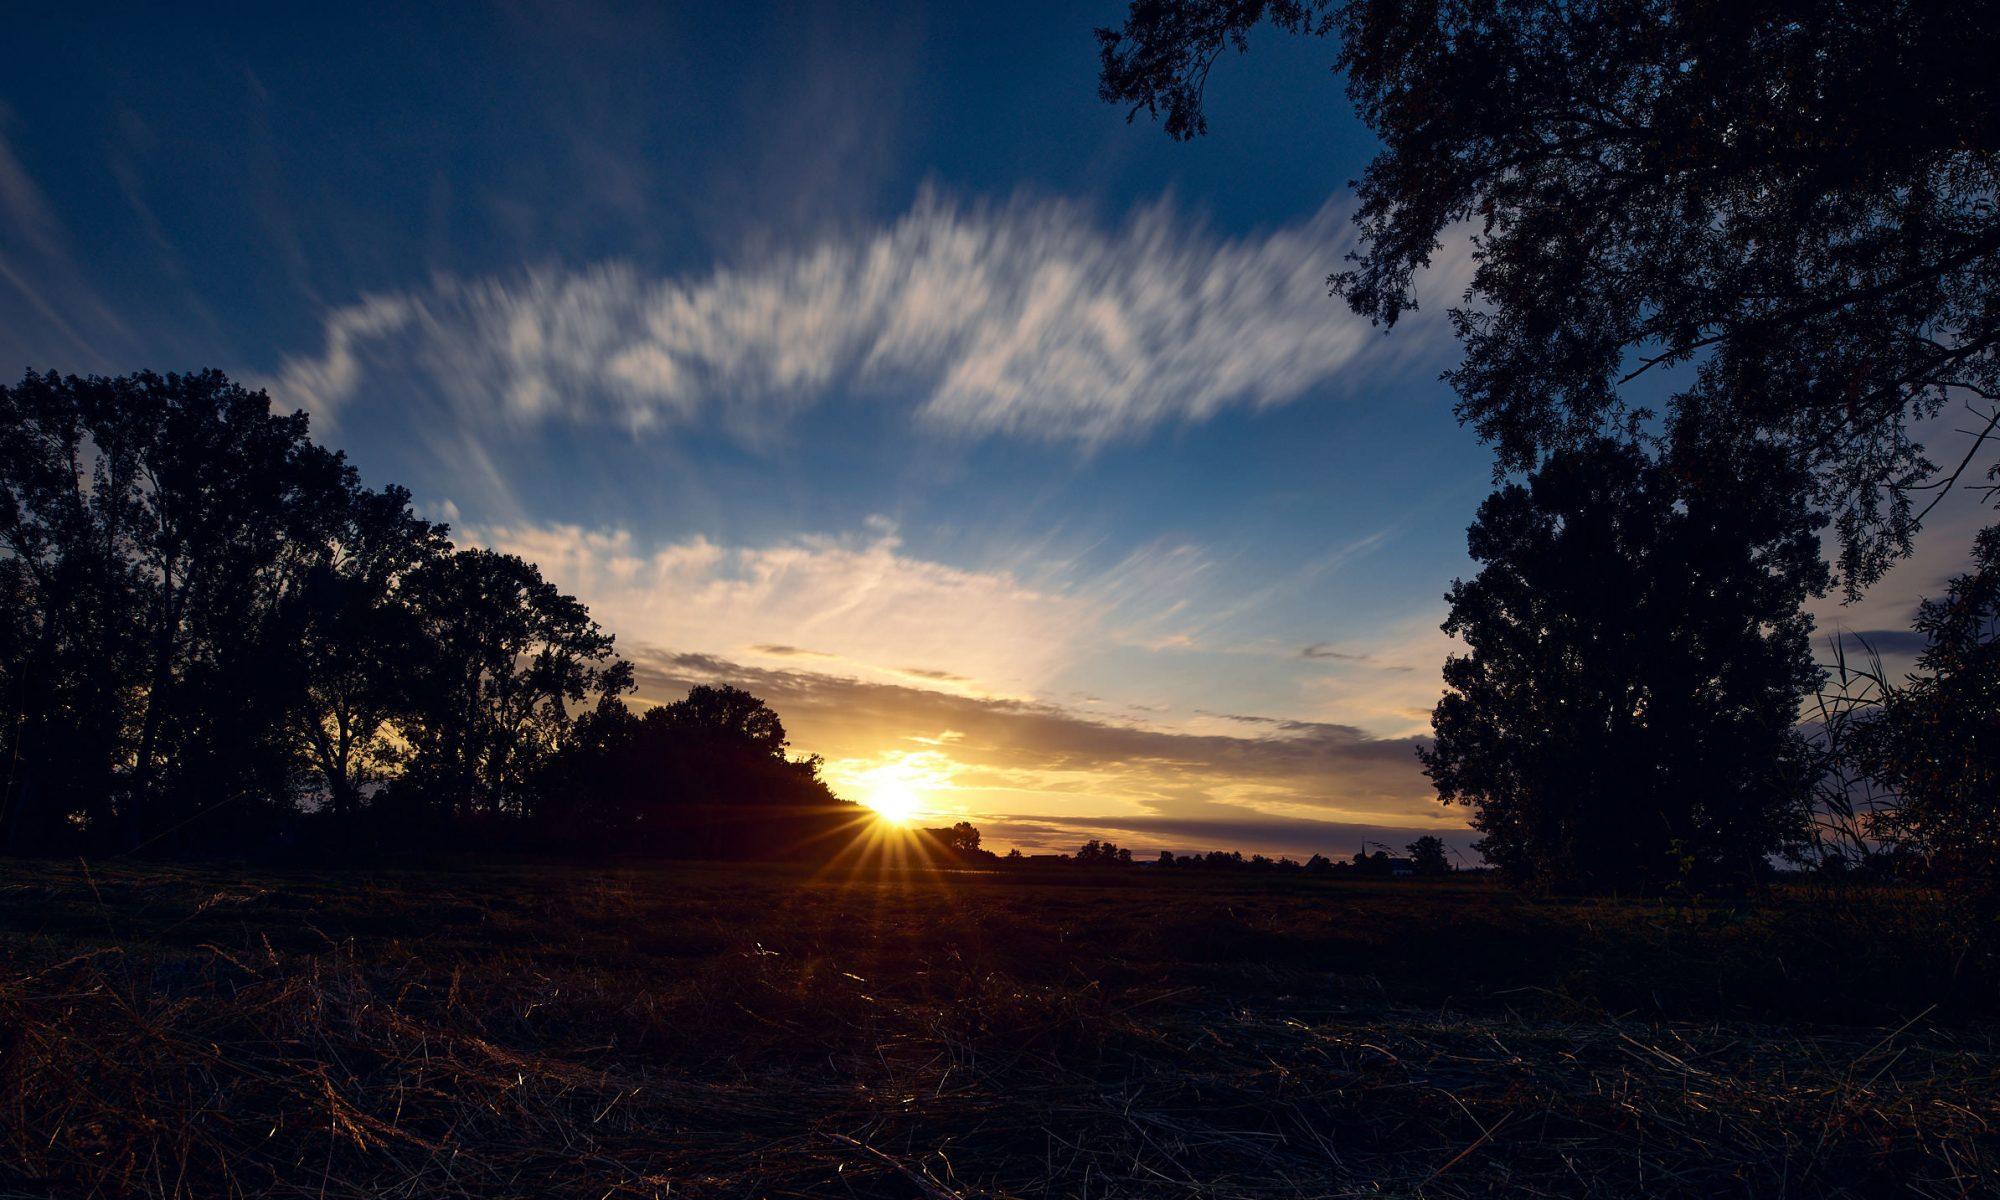 Sonnenuntergang ohne Pumpe